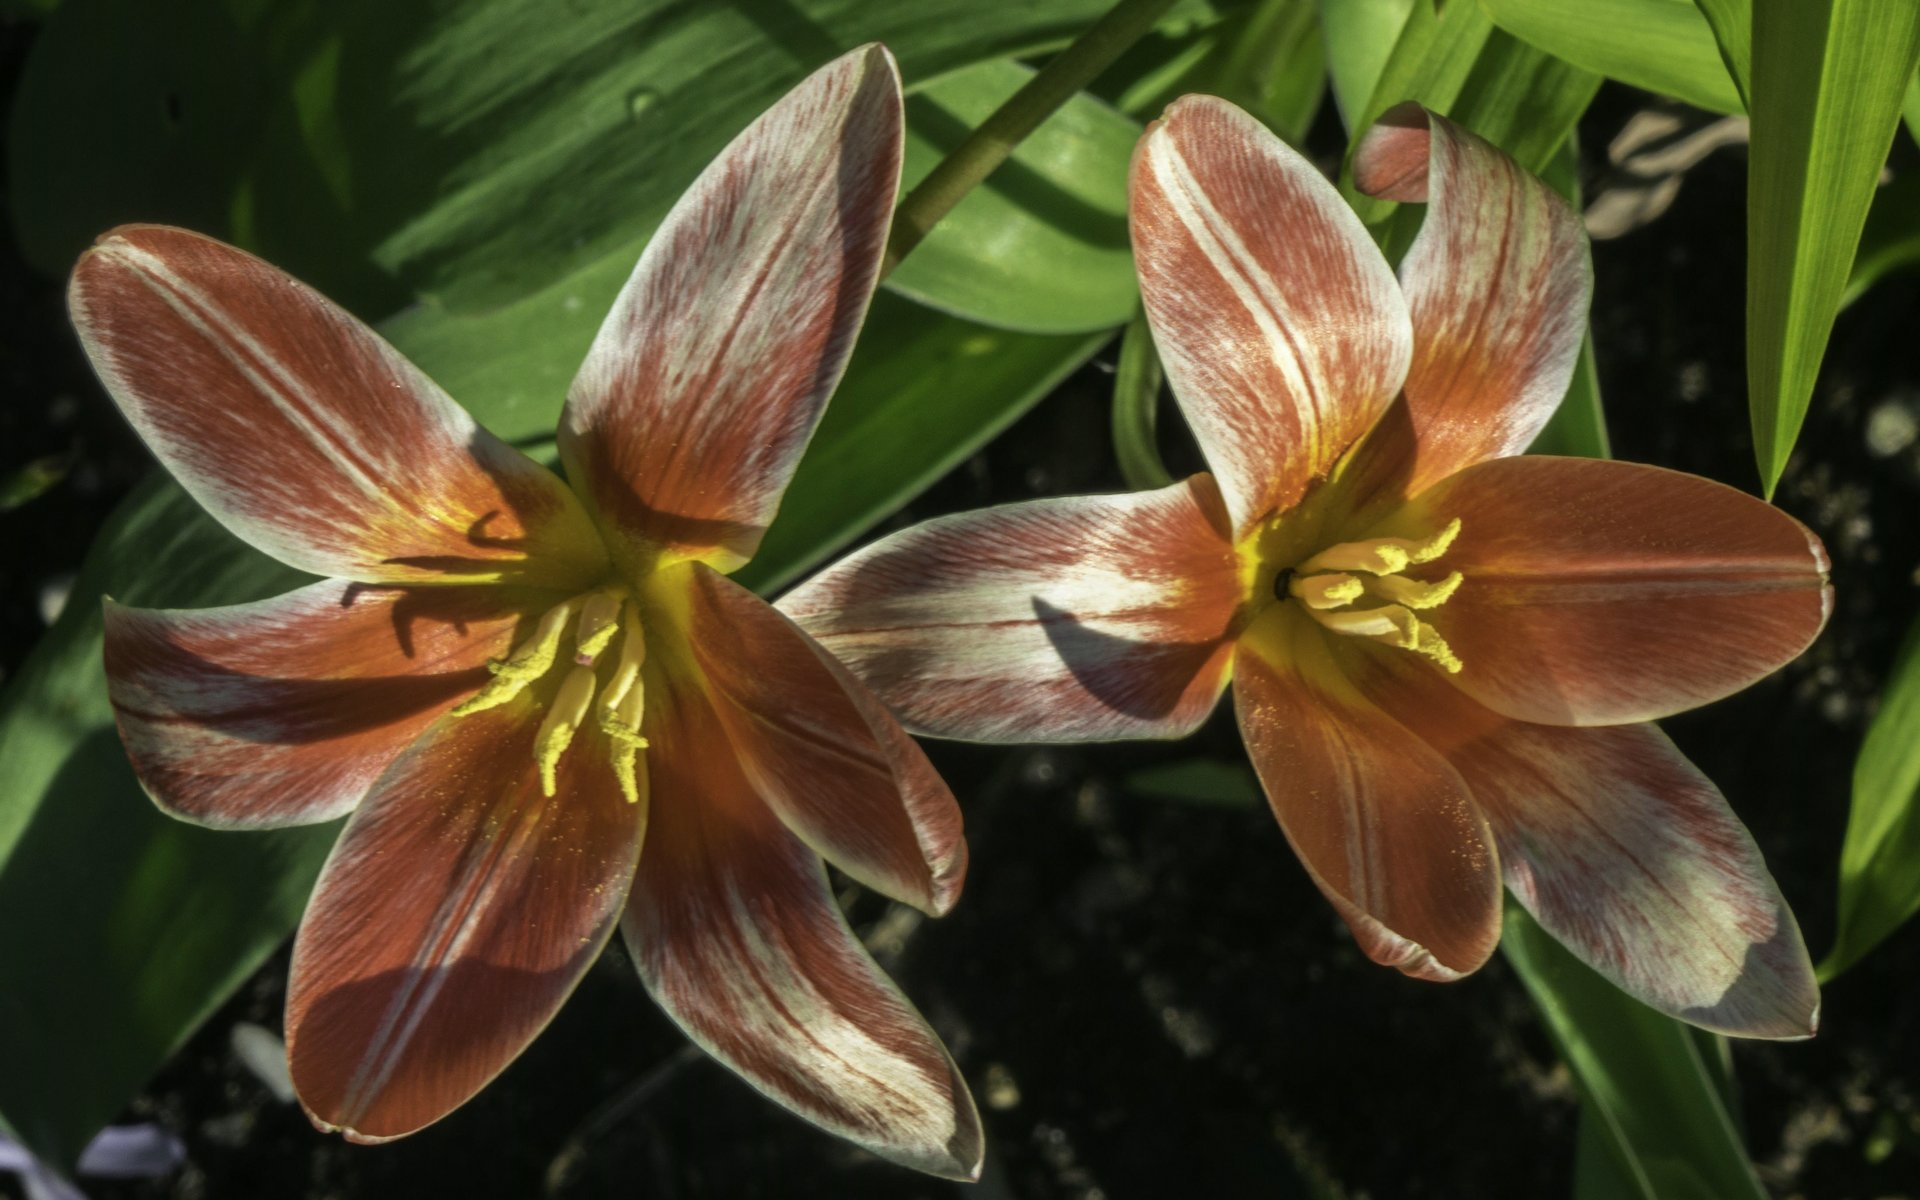 Tulpen neben dem Irisgarten des Berggartens